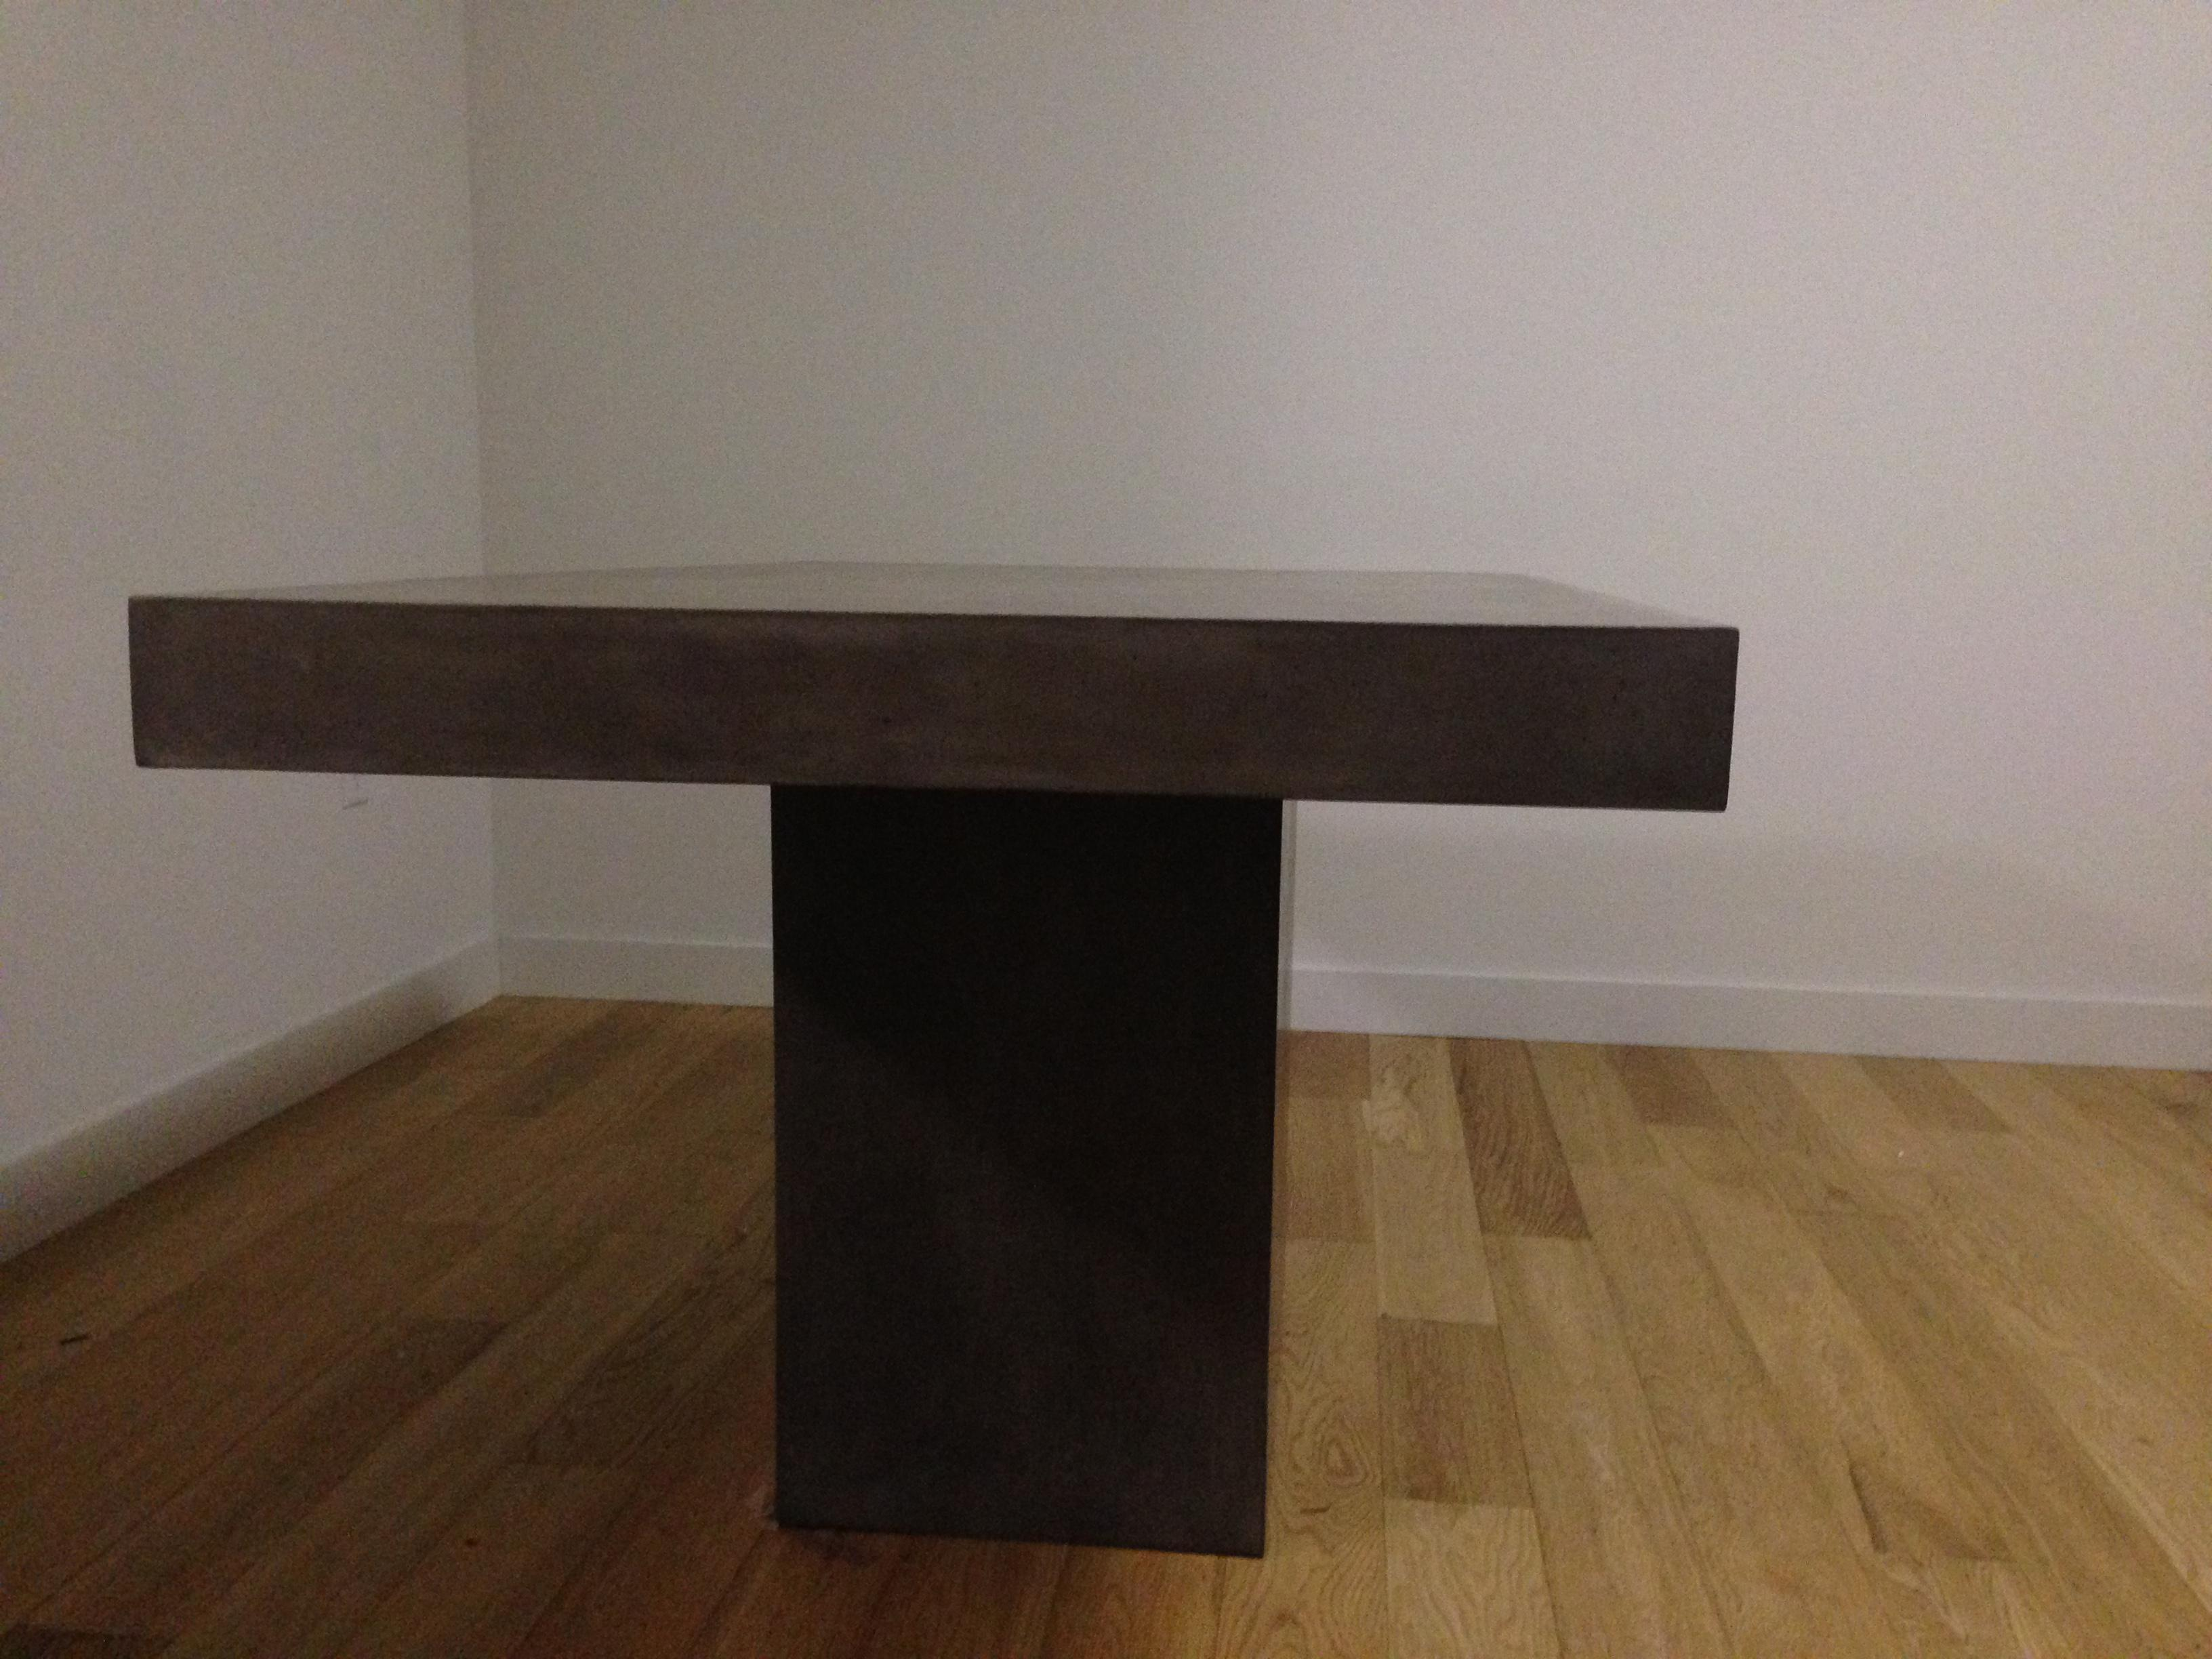 CB2 Fuze Concrete Dining Table Chairish : cb2 fuze concrete dining table 8962aspectfitampwidth640ampheight640 from www.chairish.com size 640 x 640 jpeg 26kB